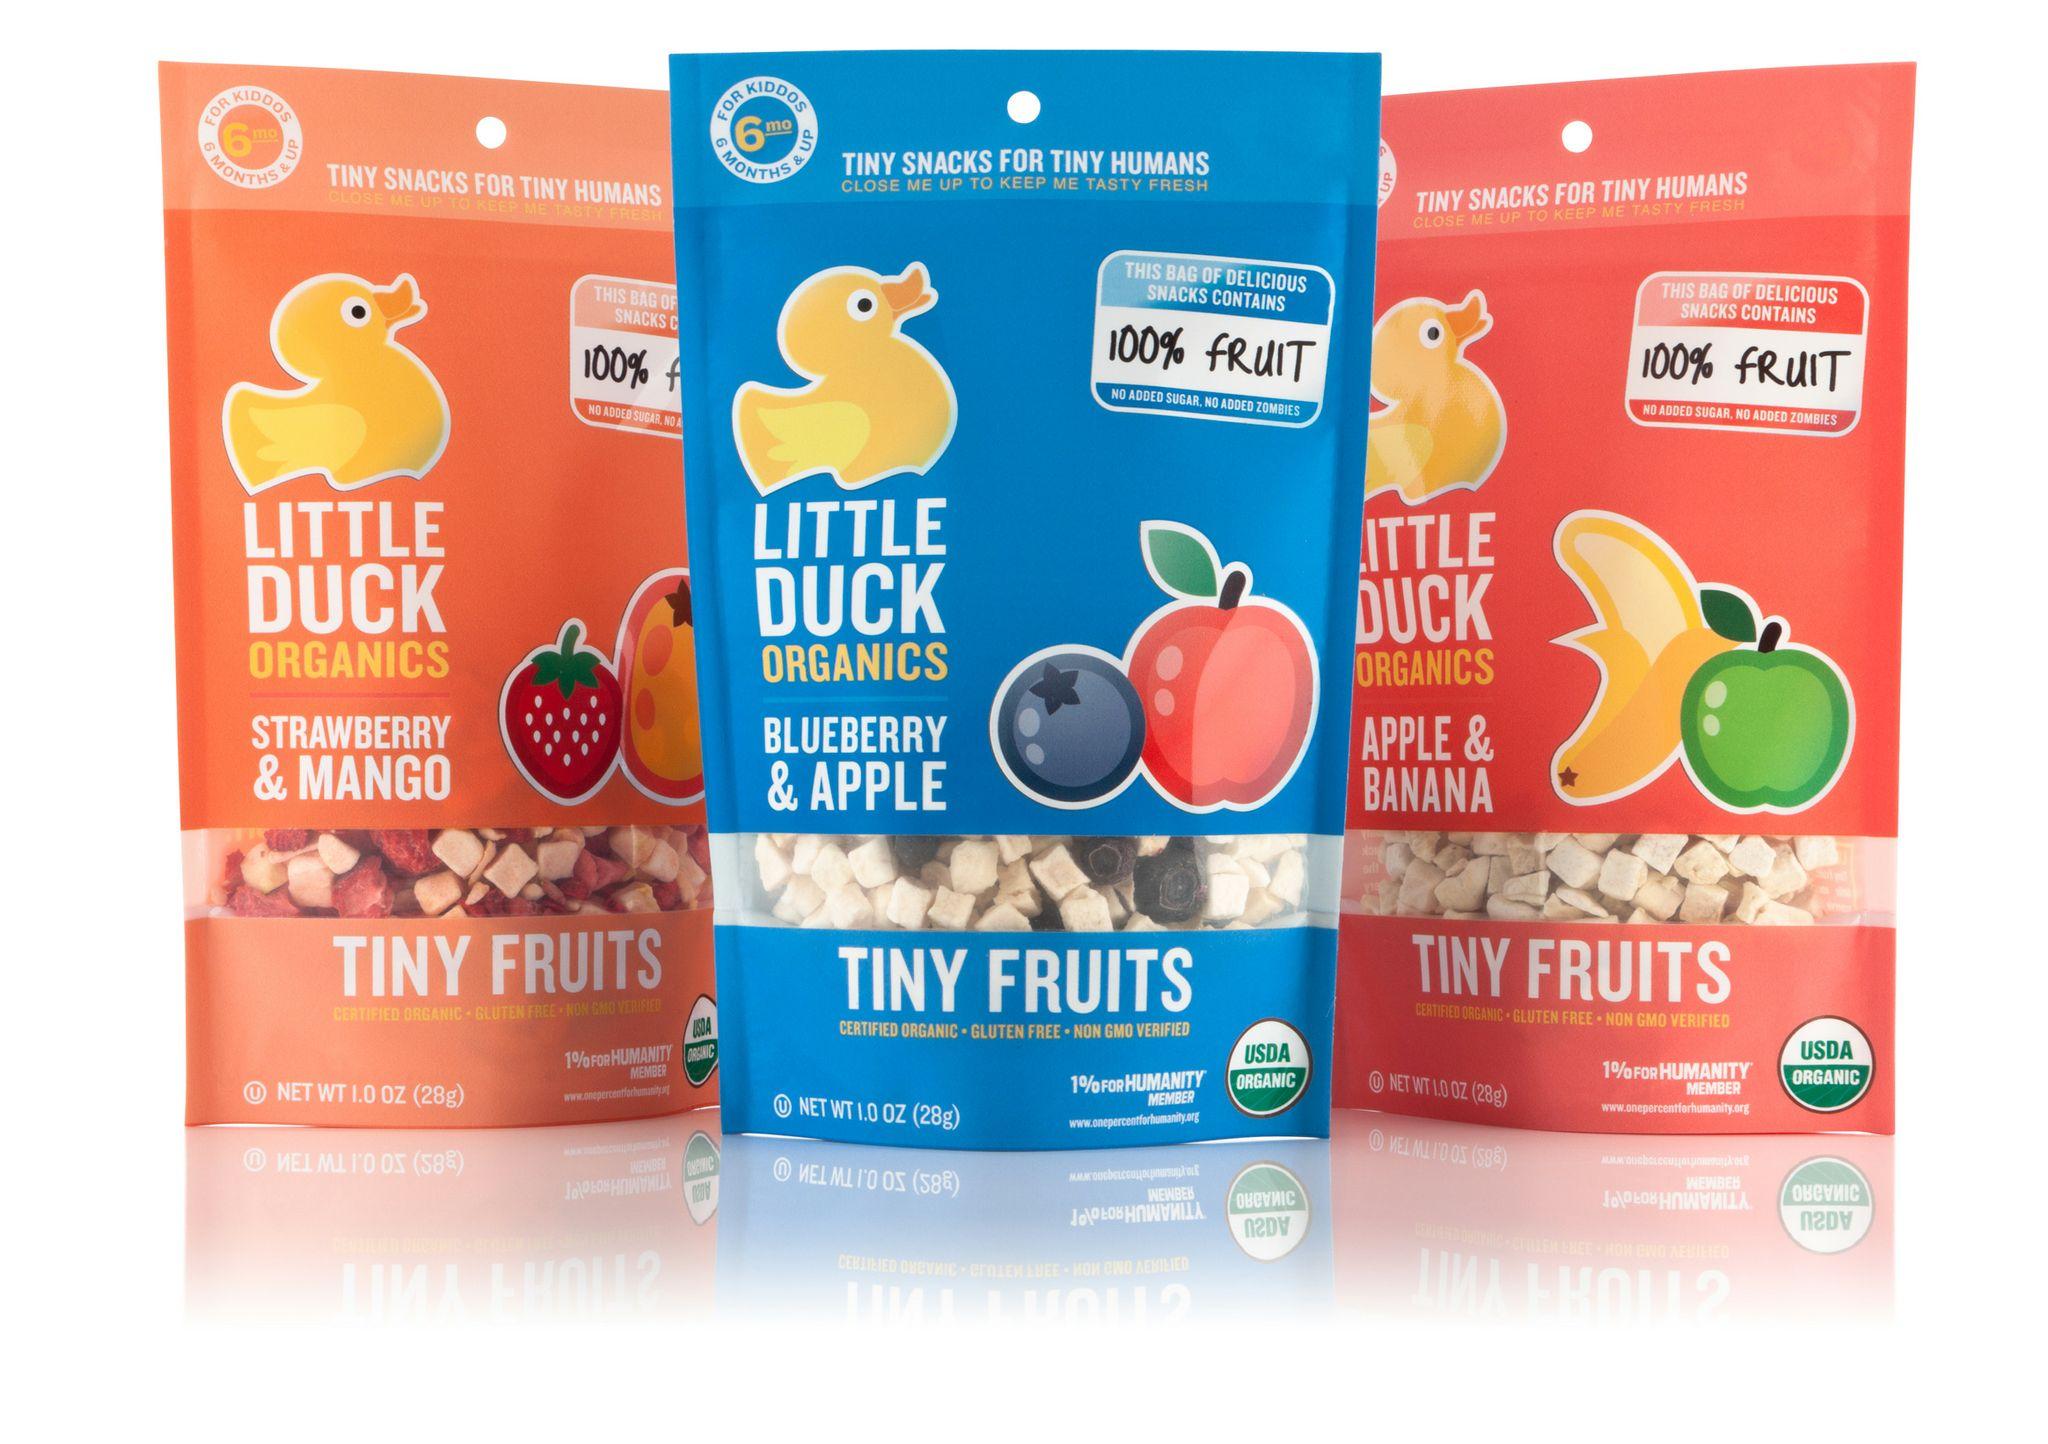 little-duck-organics-tiny-fruits.jpeg